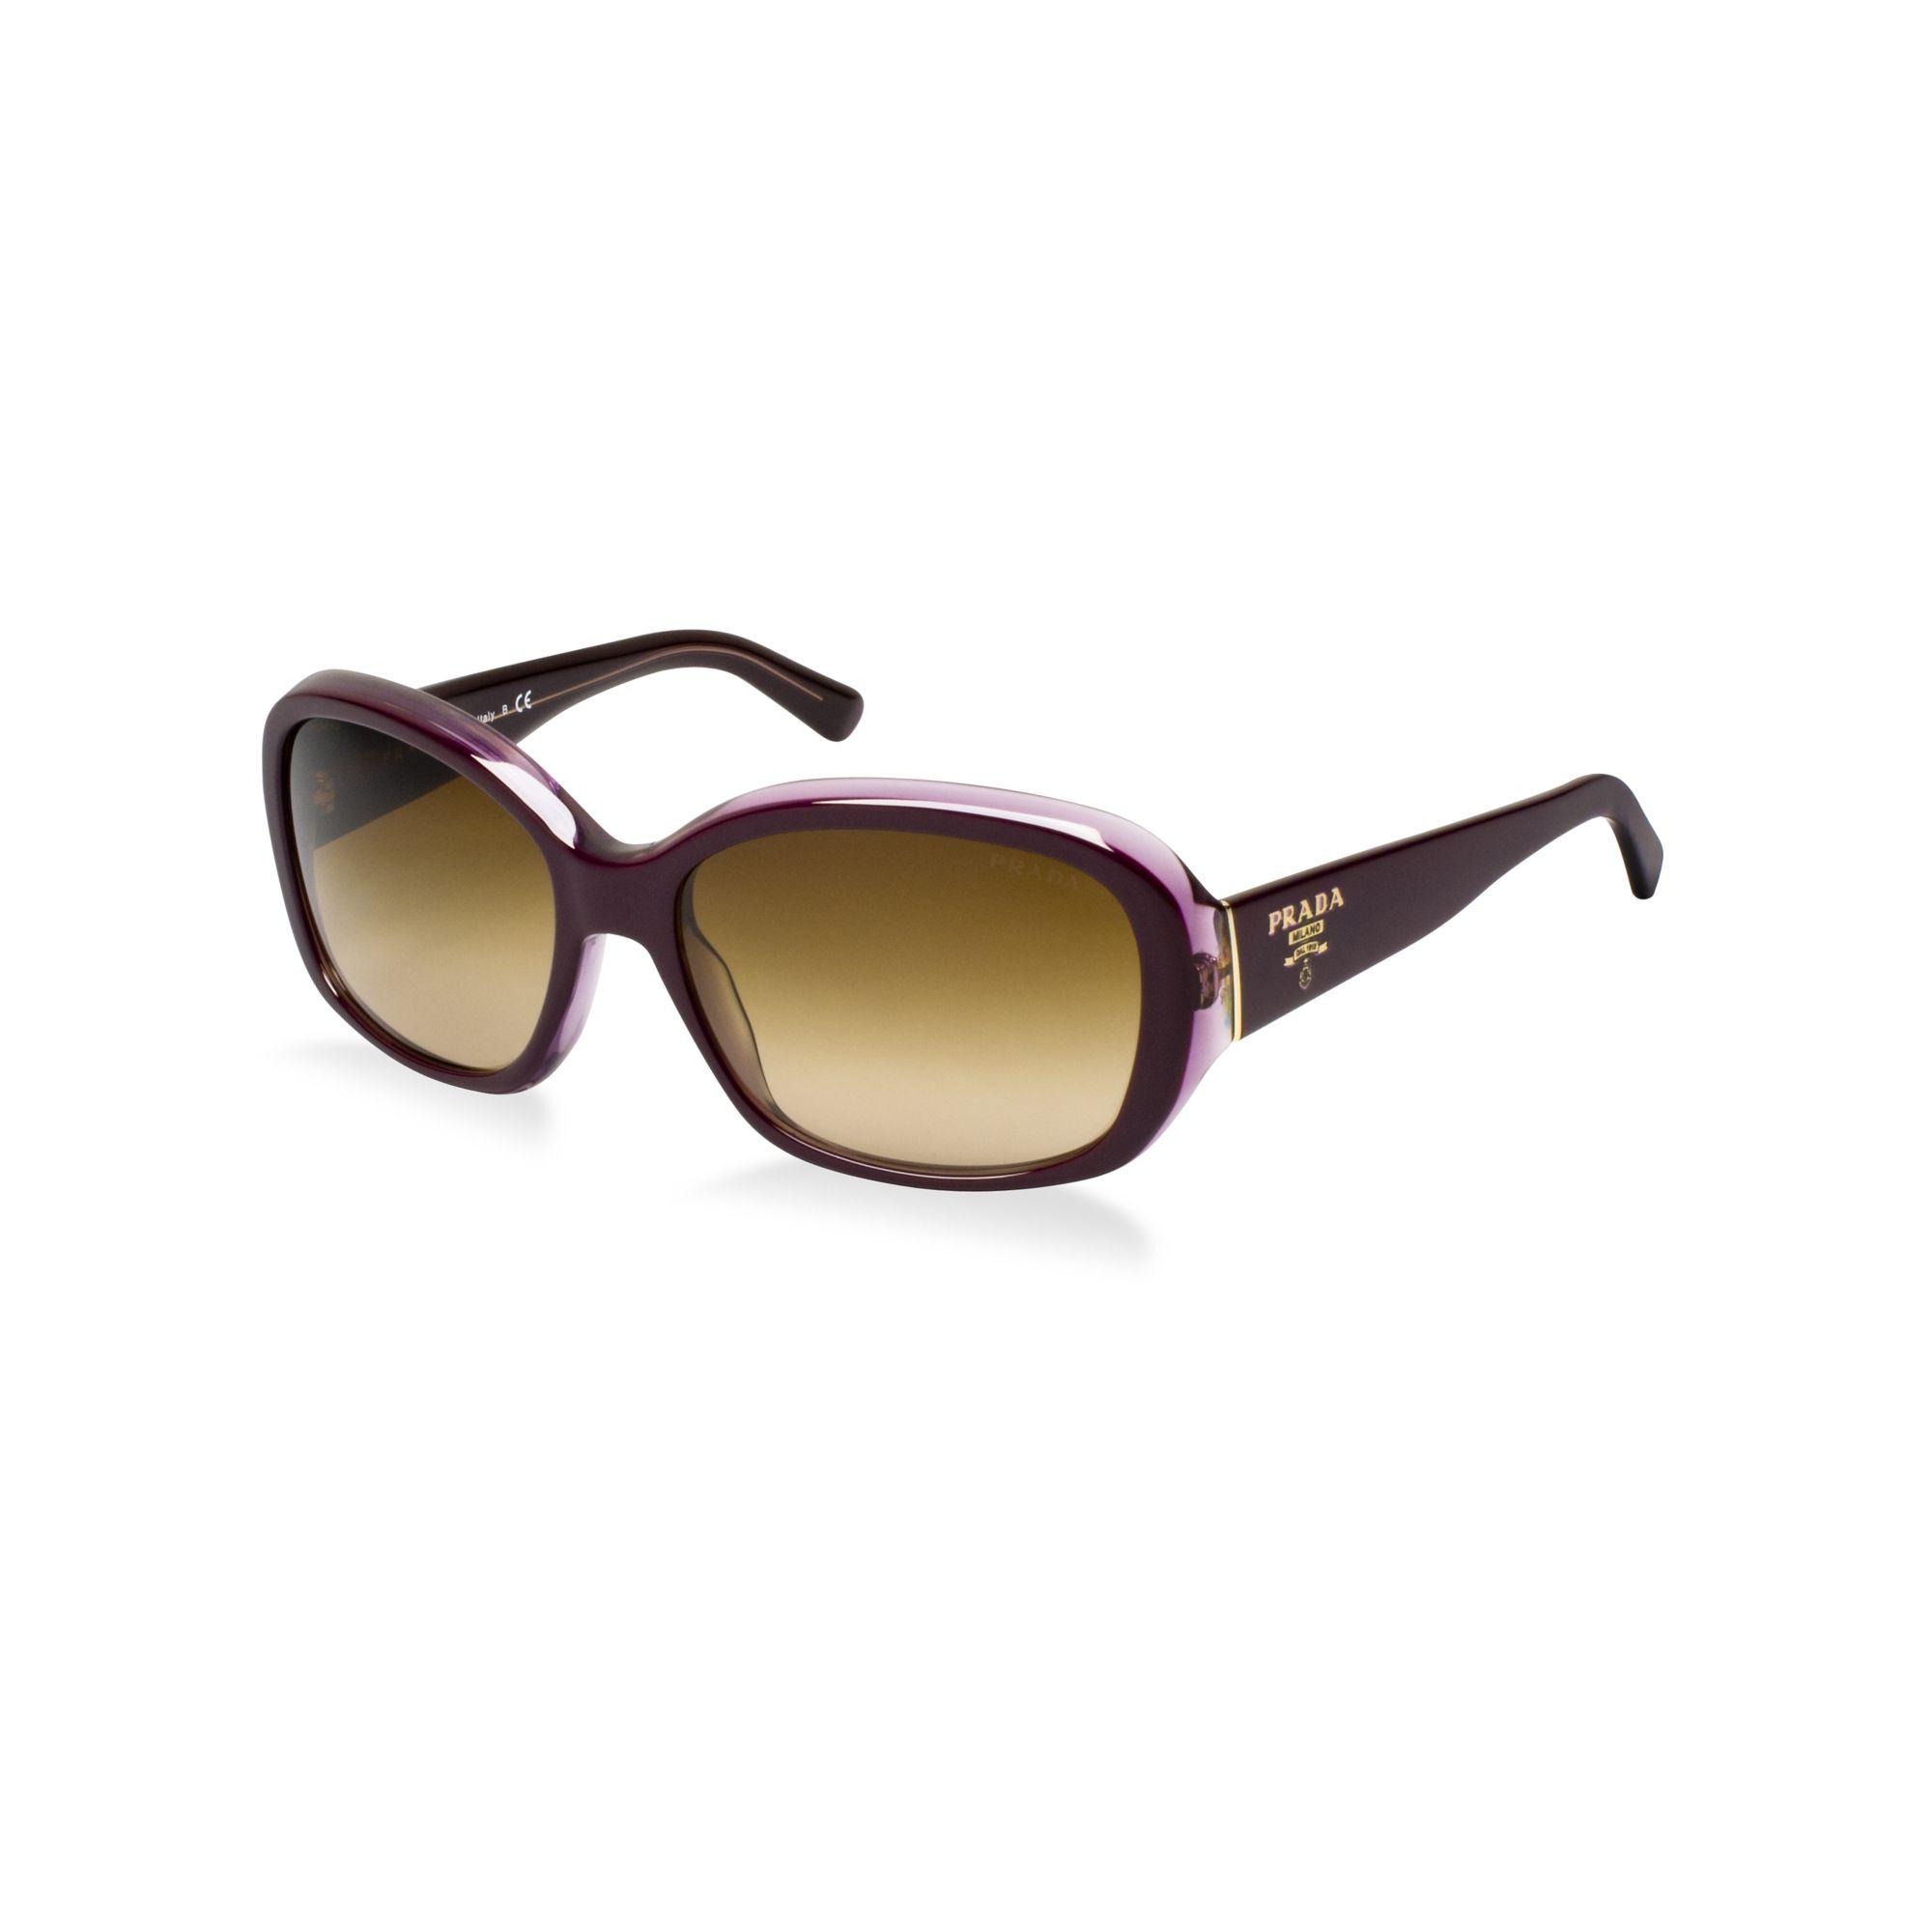 069f17b1ac604 Lyst - Prada Pr 31Ns in Purple